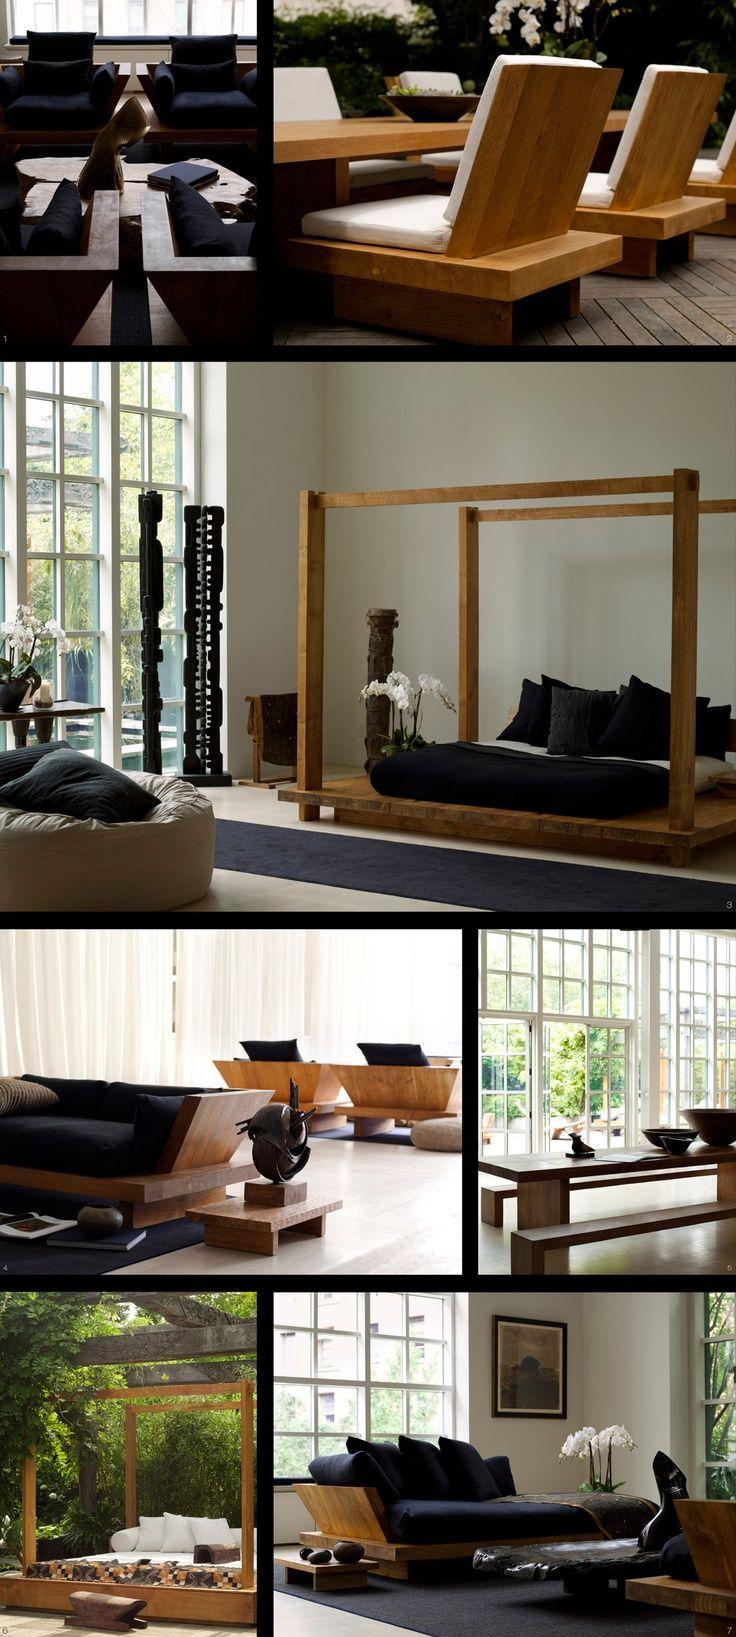 zen home furniture. urban zen home collection by donna karan furniture e